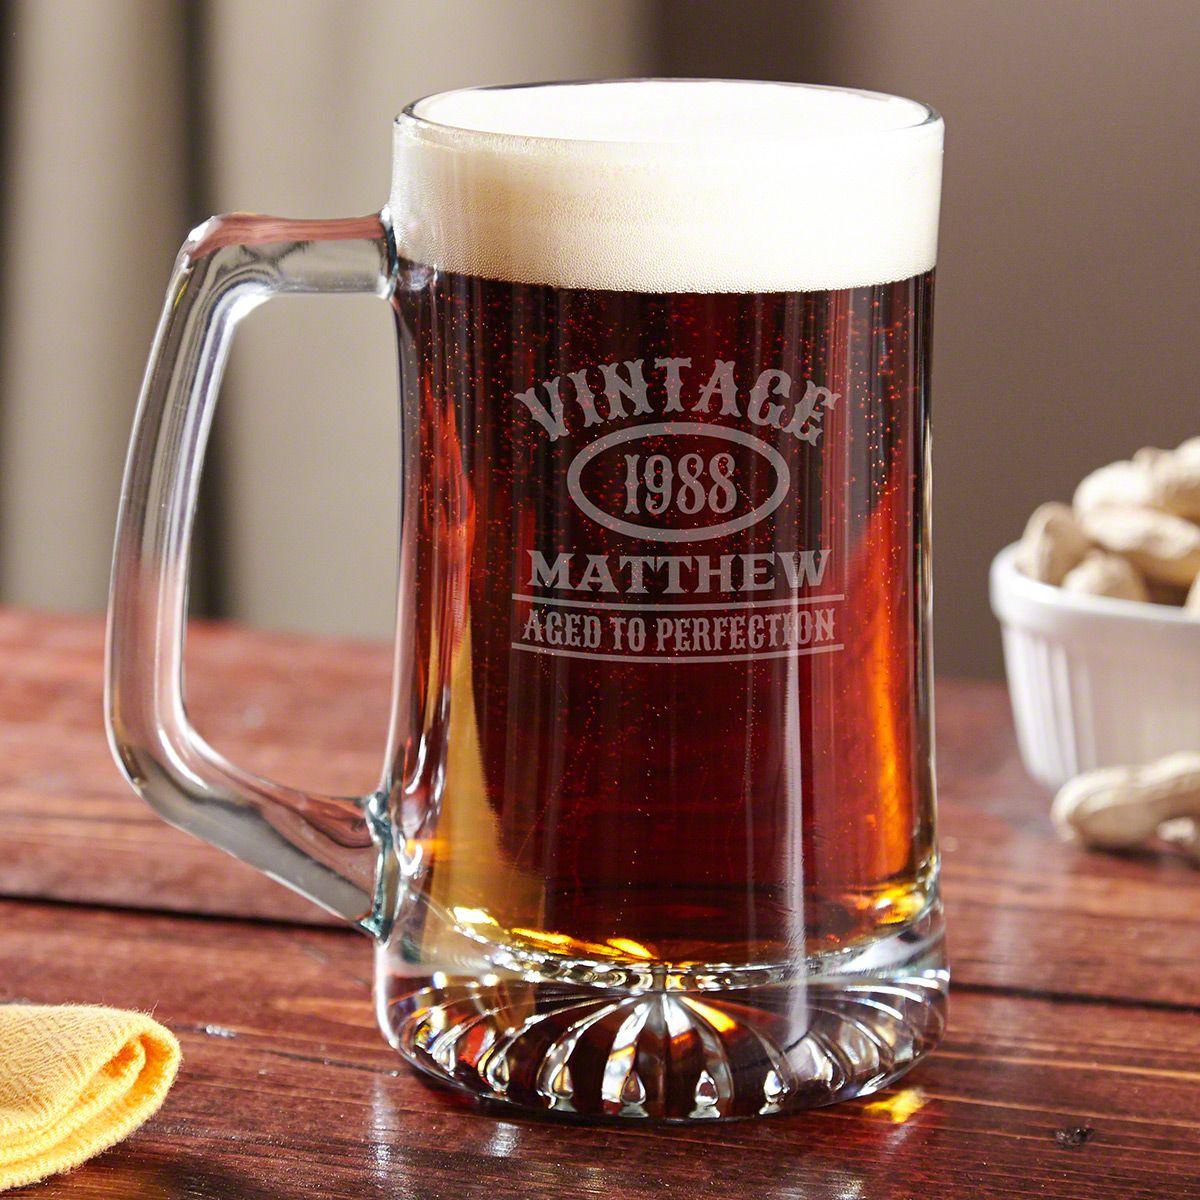 Aged to Perfection Beer Mug